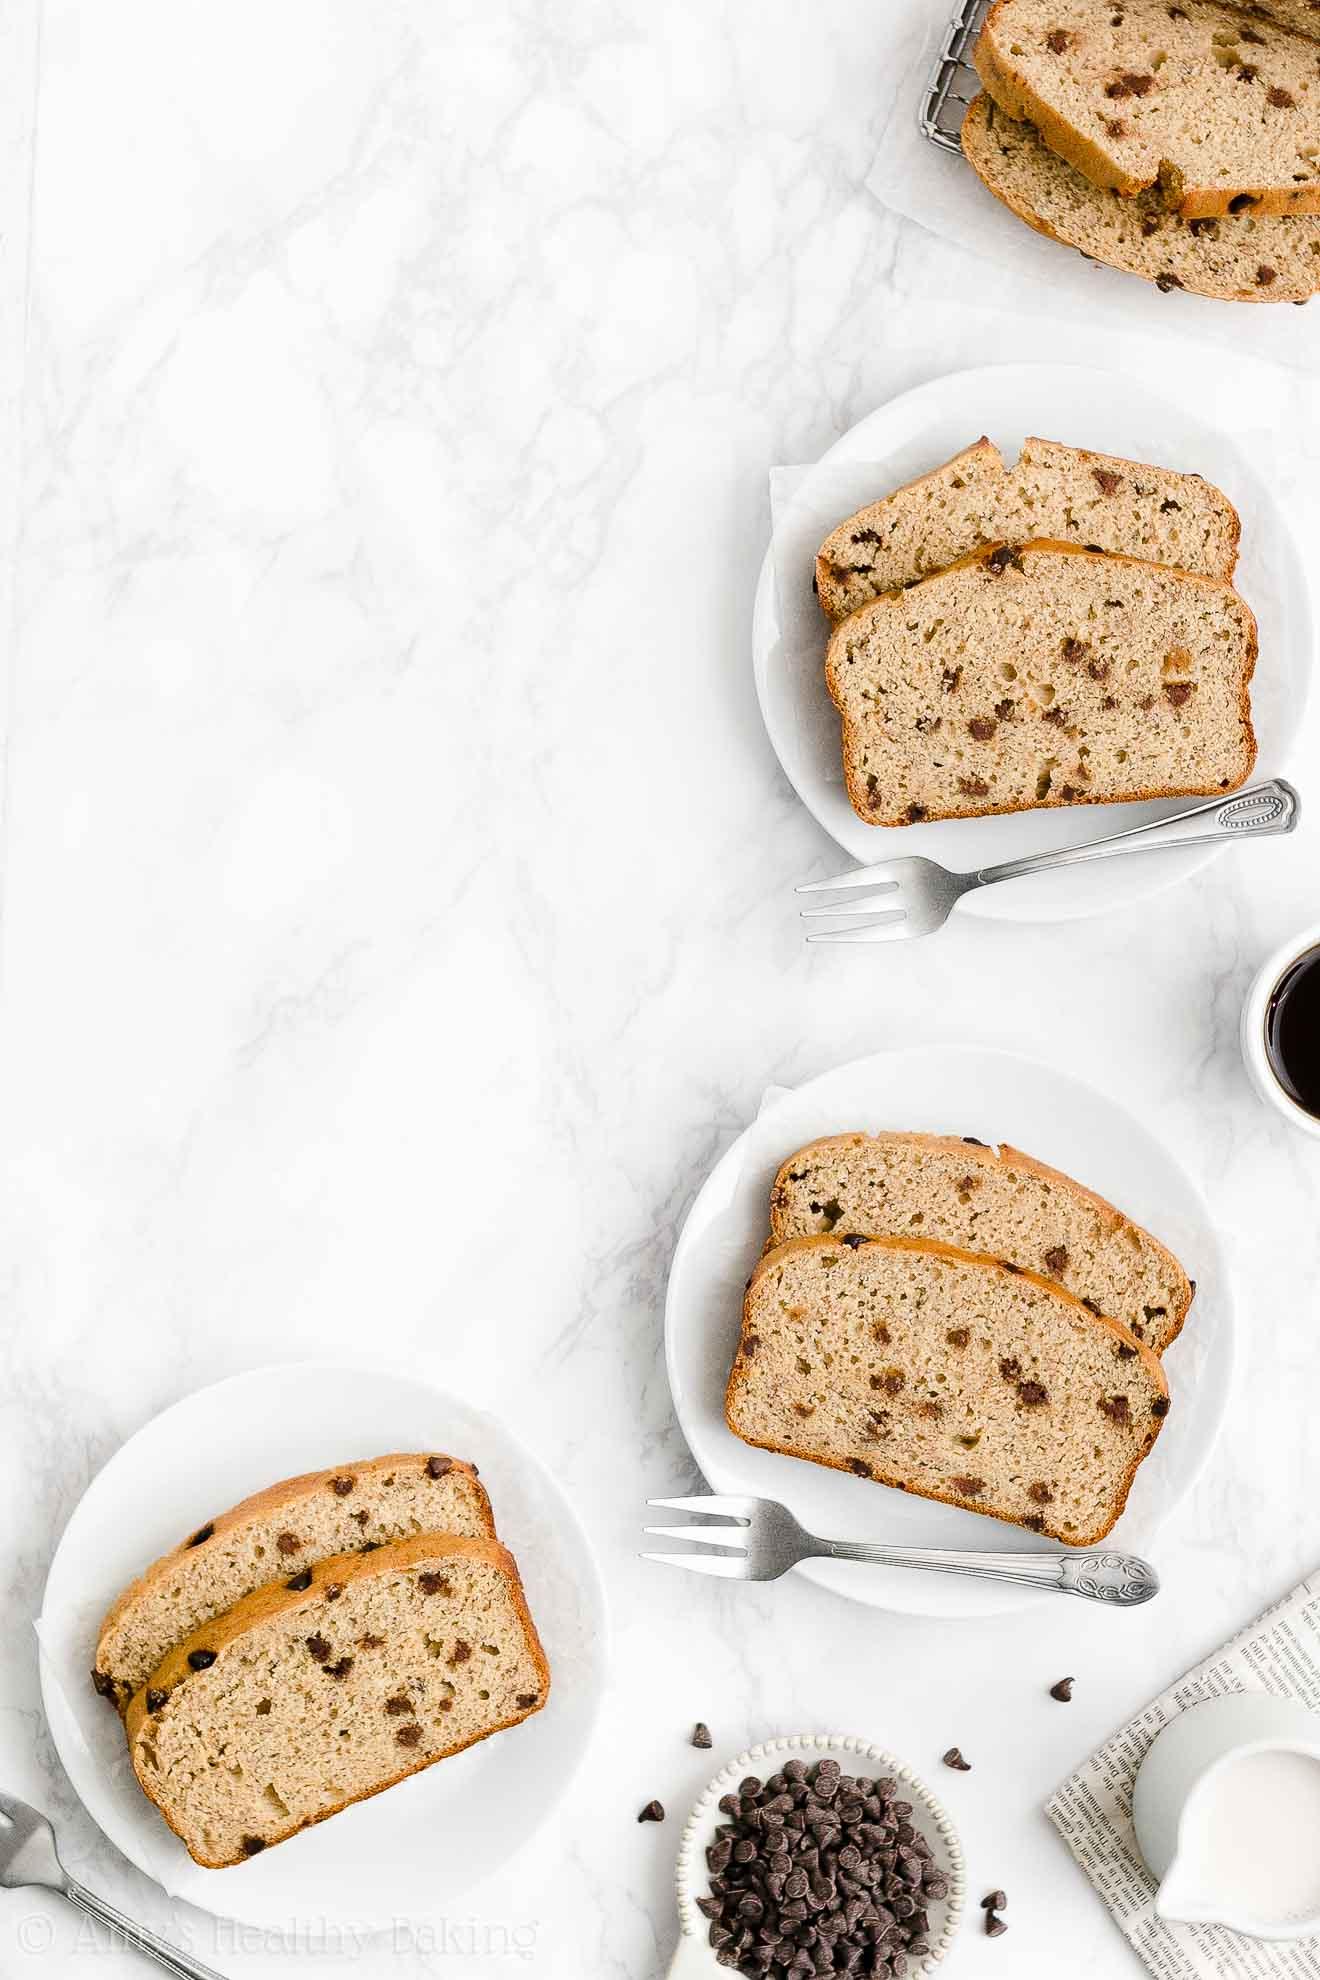 Best Easy Healthy Whole Wheat Sugar Free Moist Chocolate Chip Banana Bread